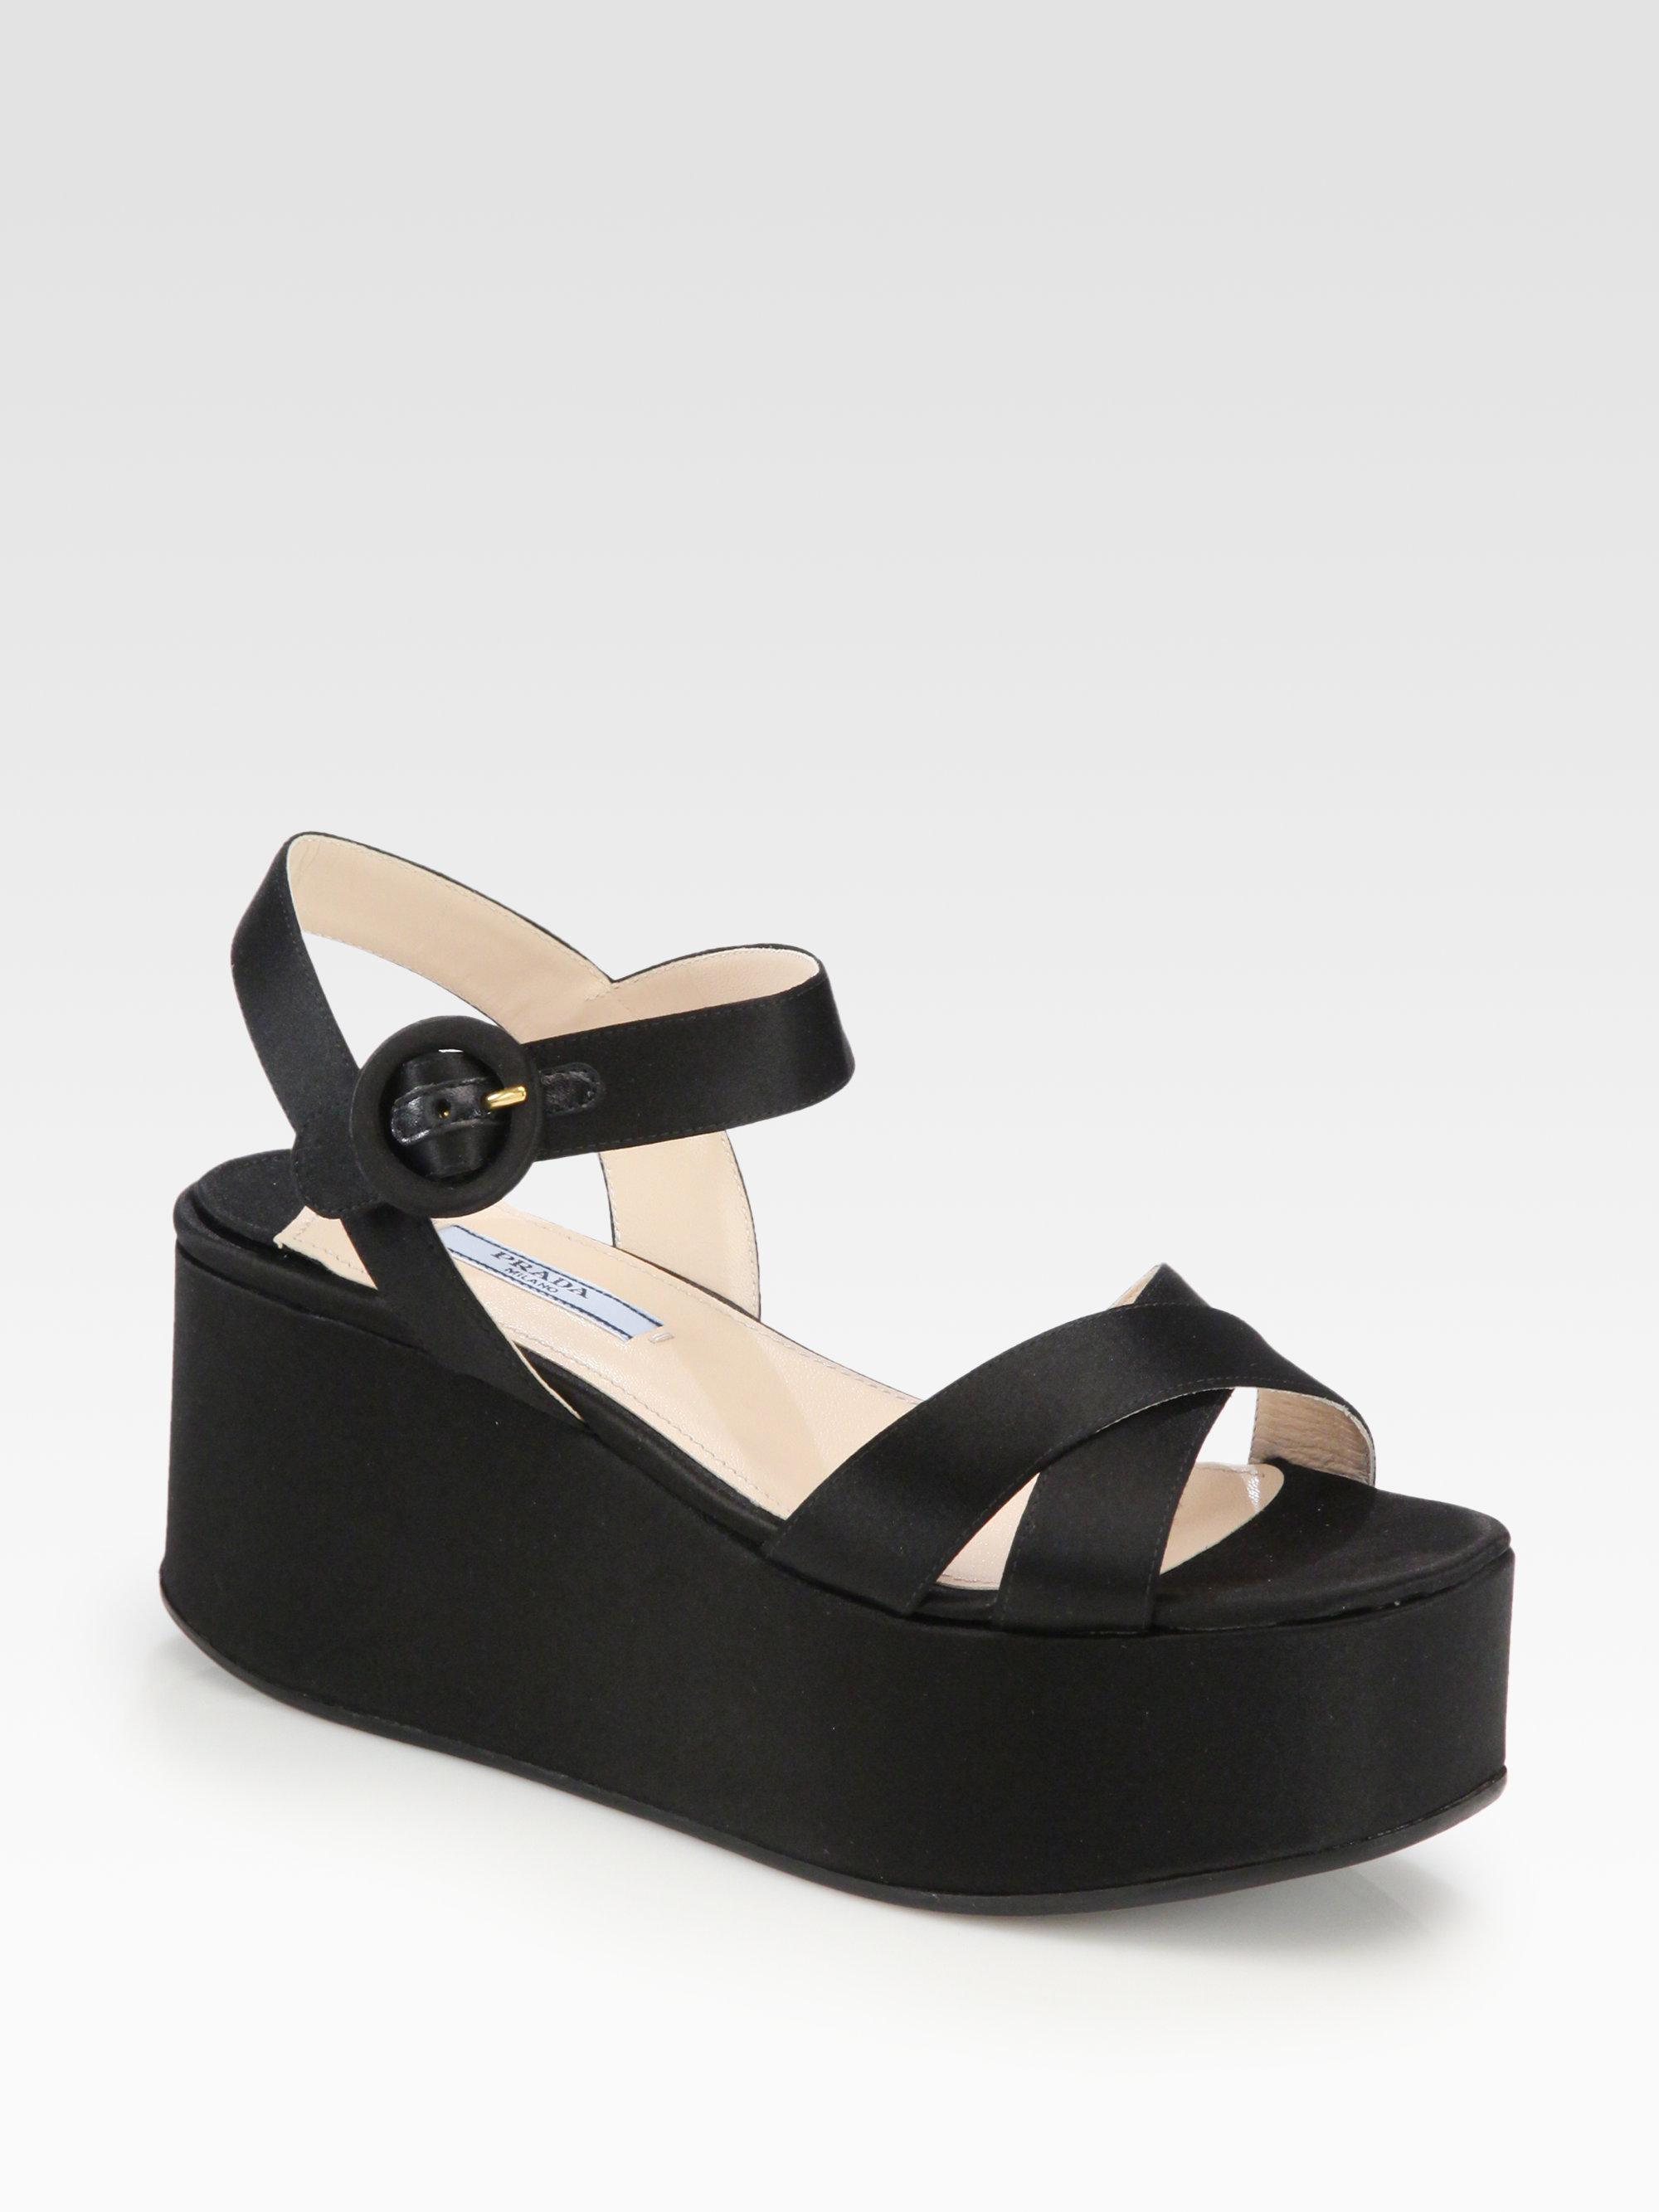 0178024b3 Prada Satin Platform Wedge Sandals in Black - Lyst